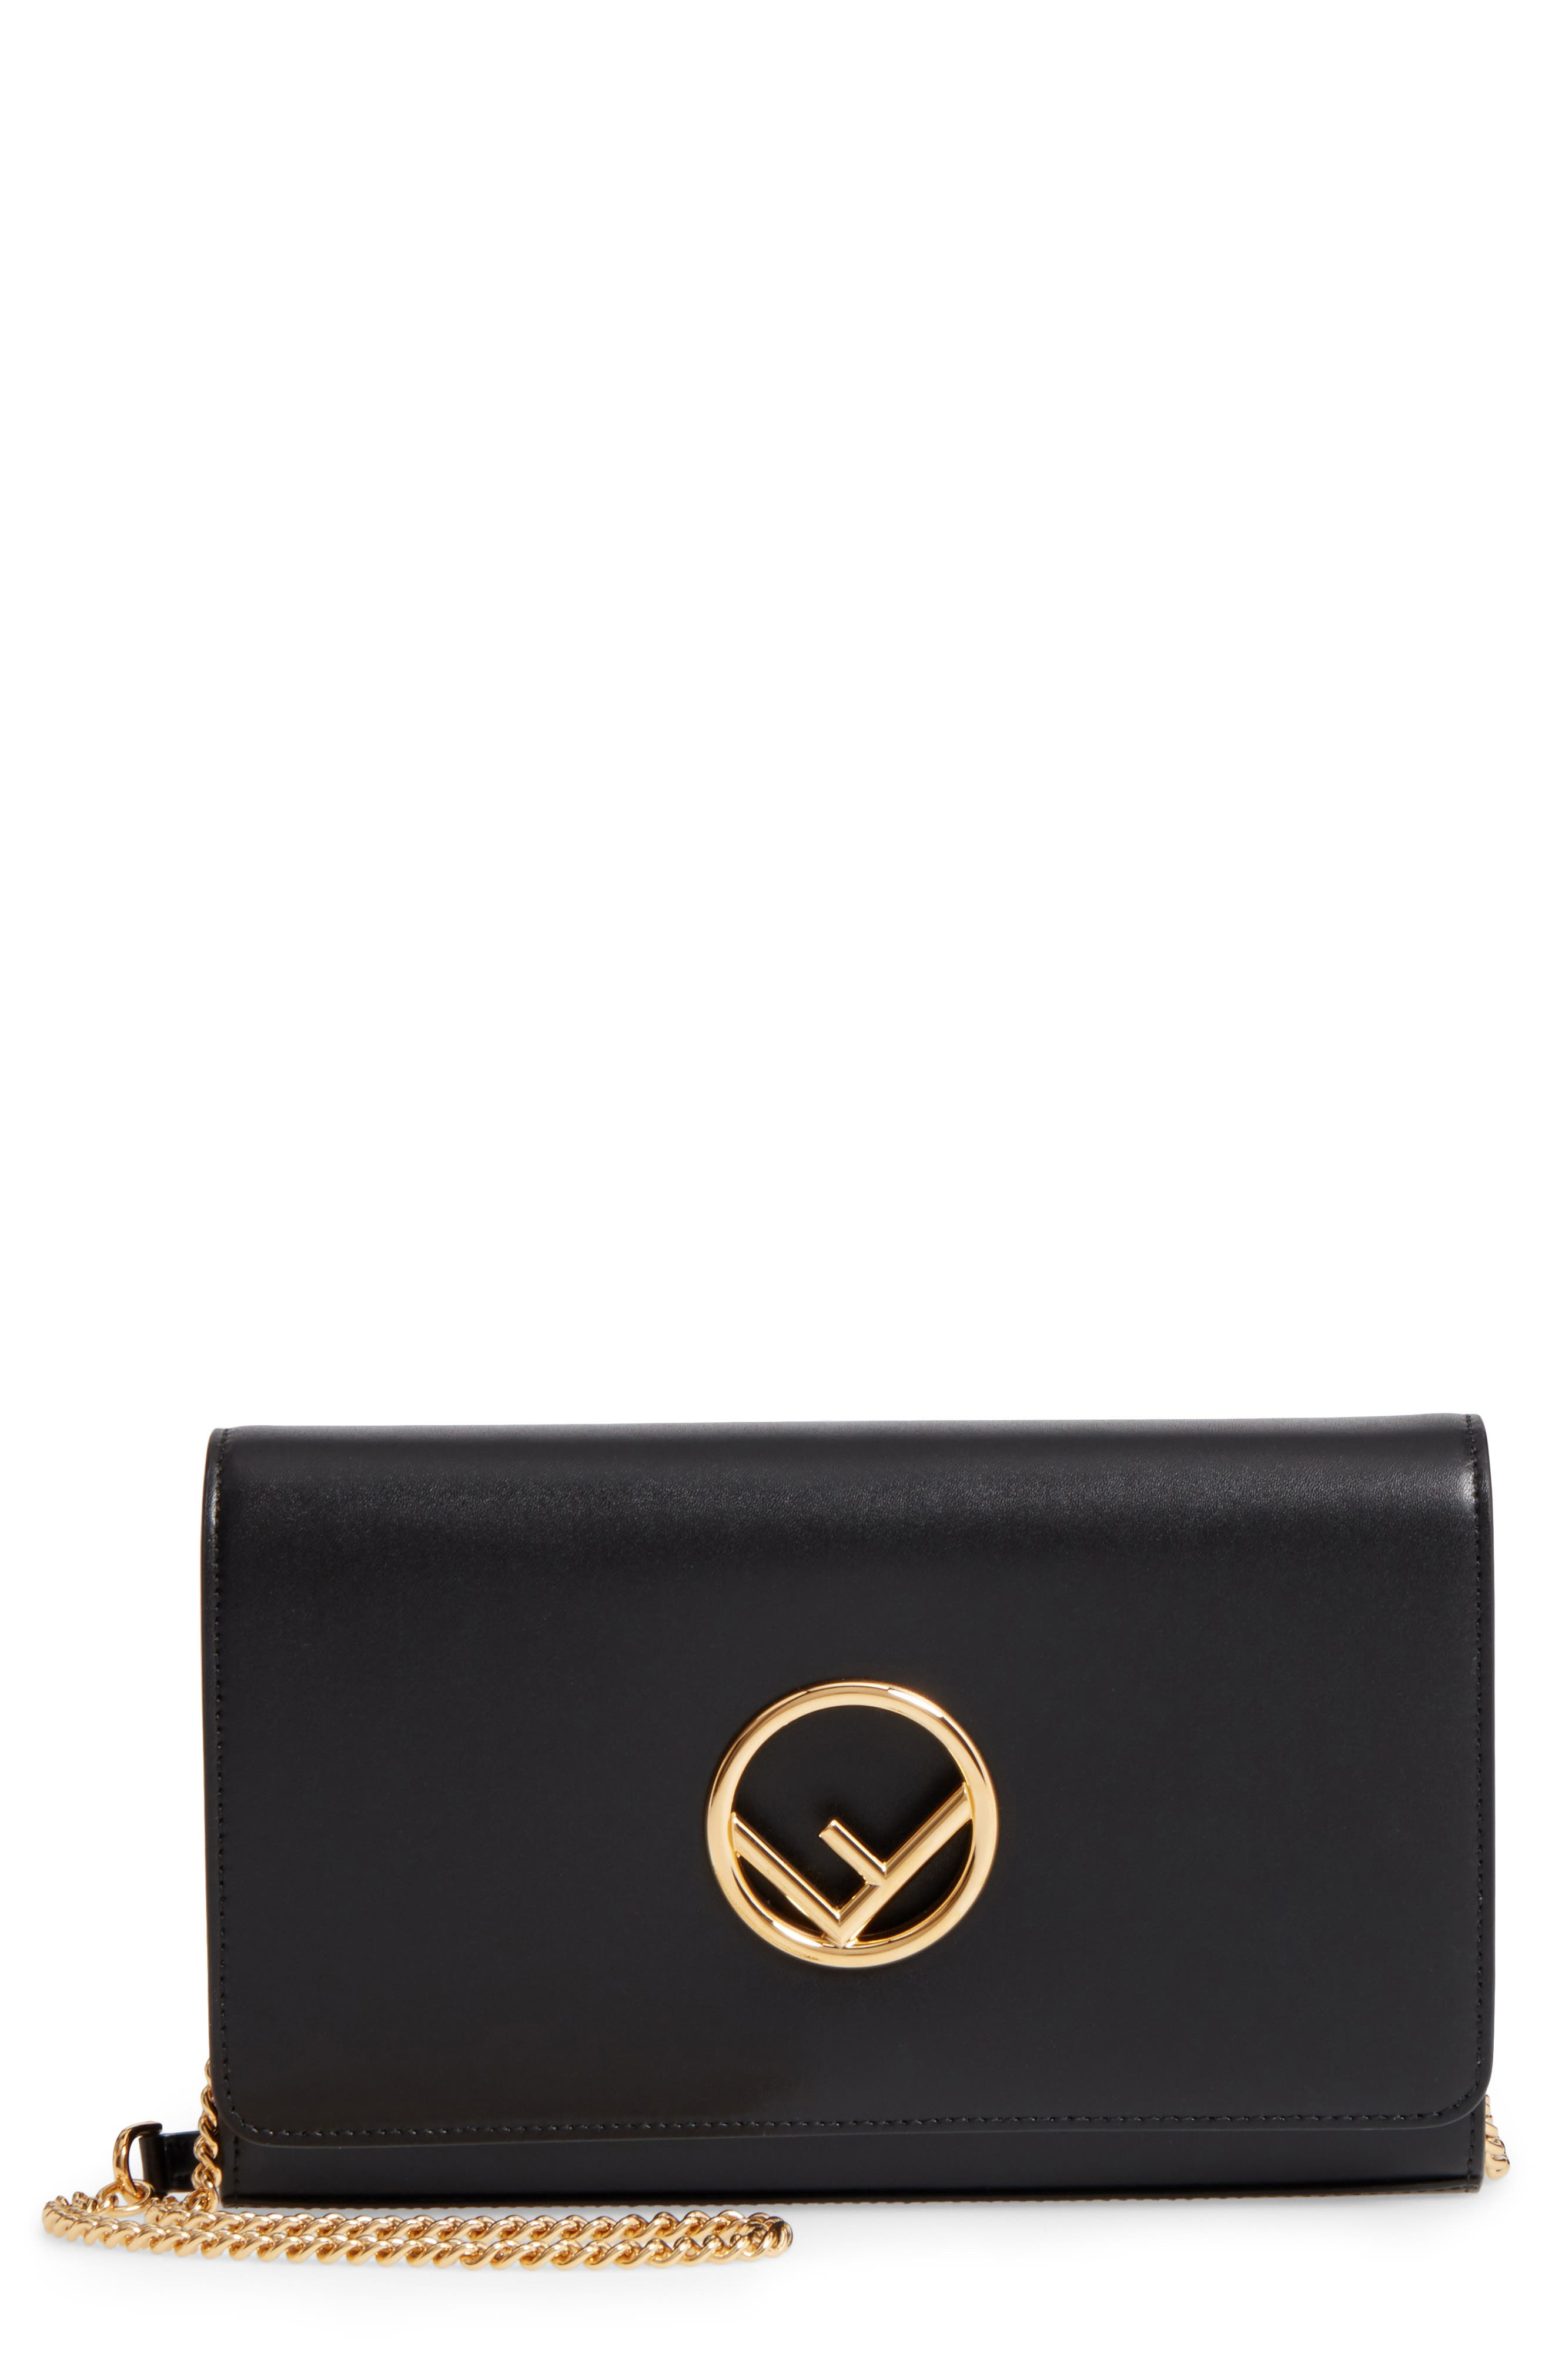 Main Image - Fendi Liberty Logo Calfskin Leather Wallet on a Chain